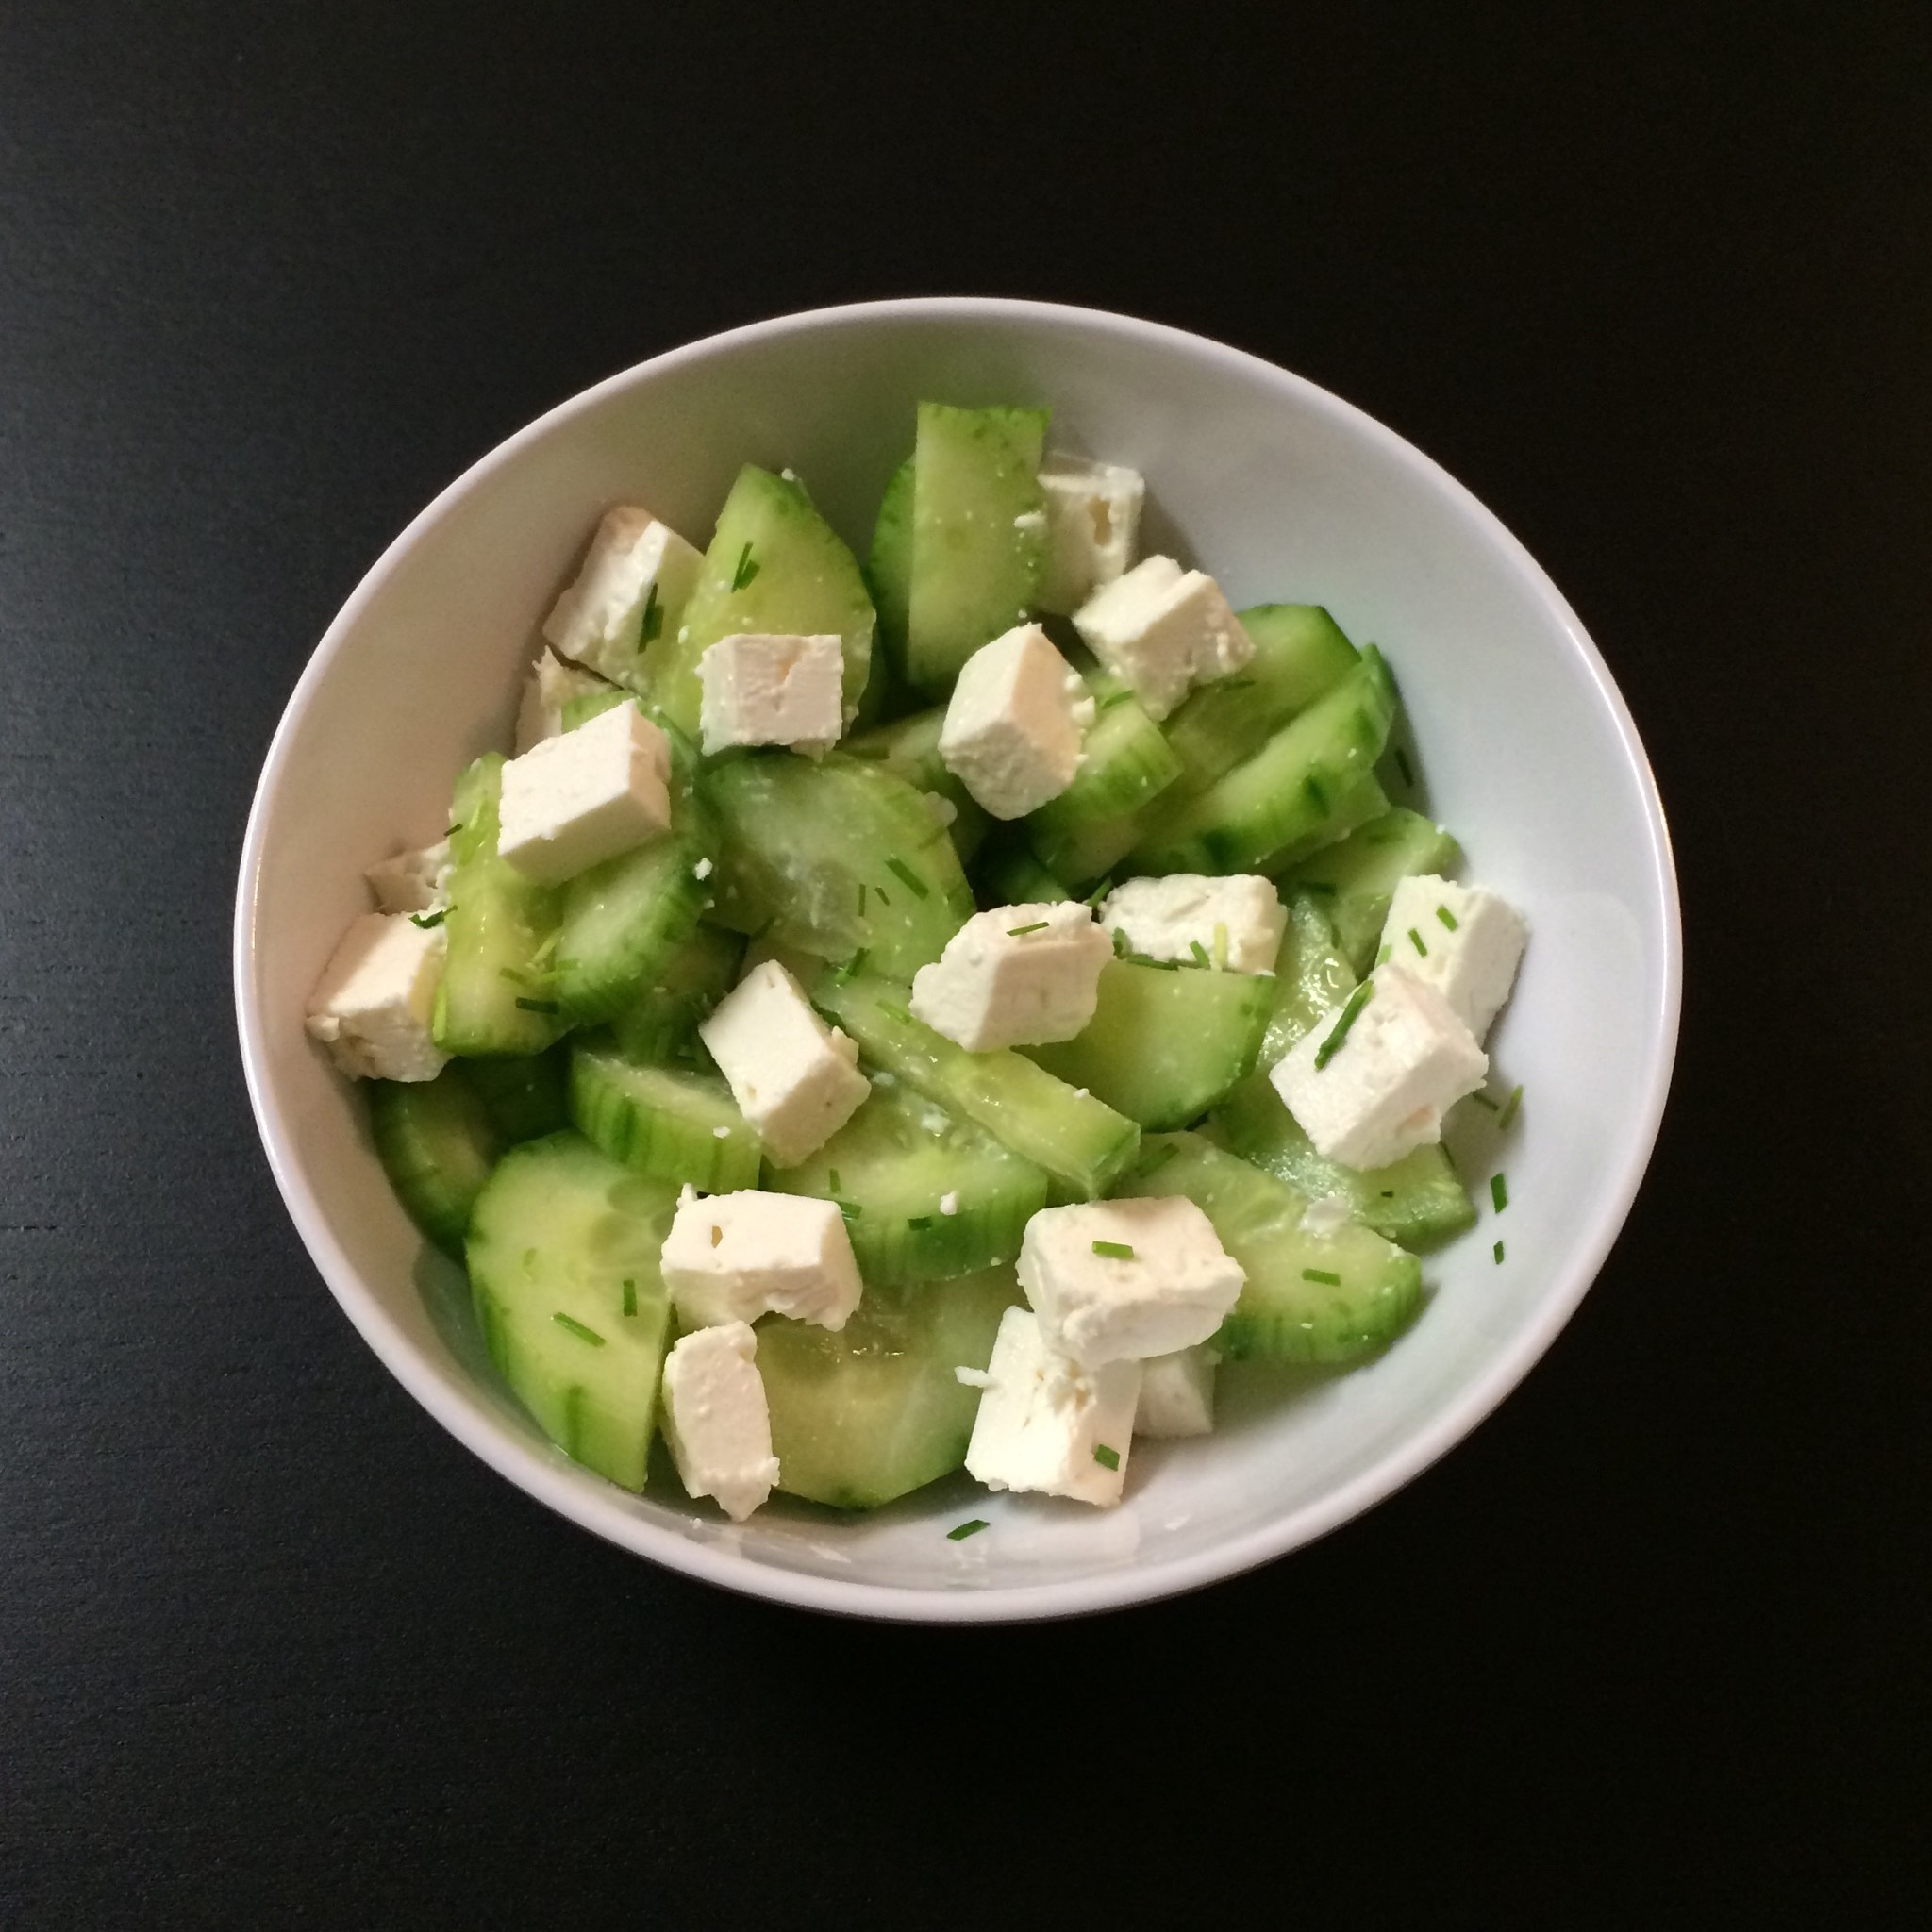 gurken feta salat healthy food supplements. Black Bedroom Furniture Sets. Home Design Ideas